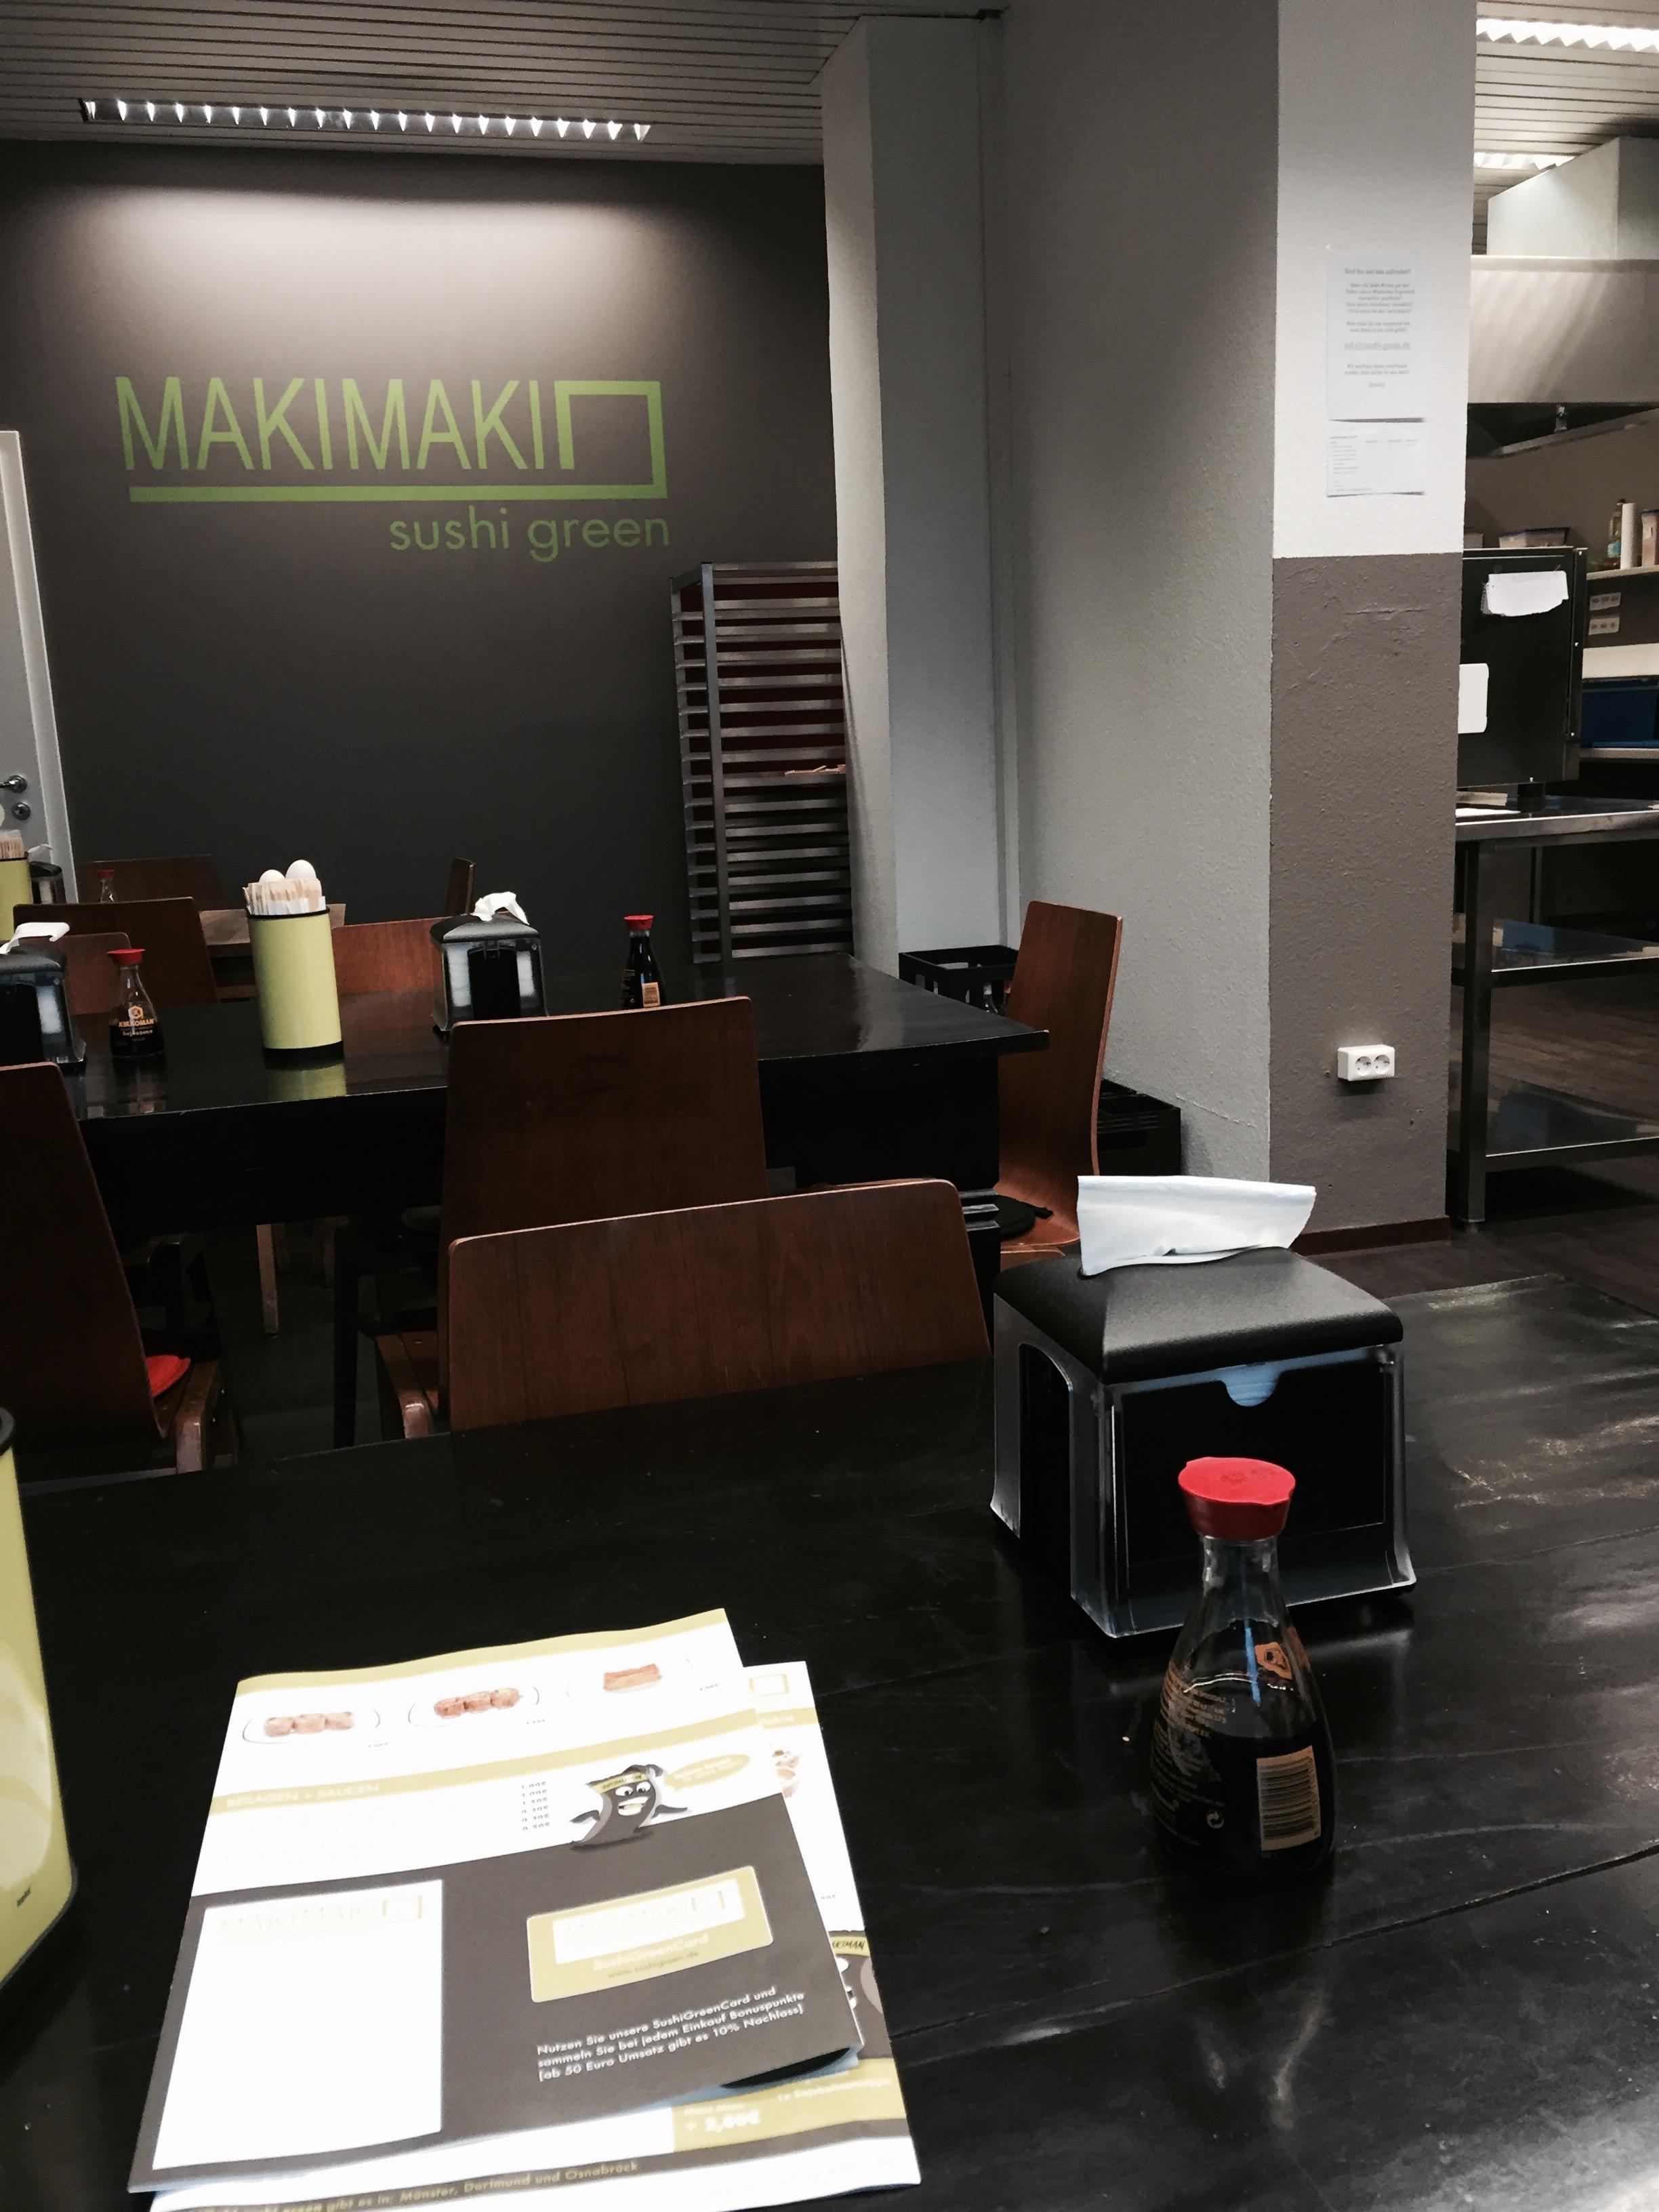 makimaki sushi green dortmund do vego vegan beim sport. Black Bedroom Furniture Sets. Home Design Ideas